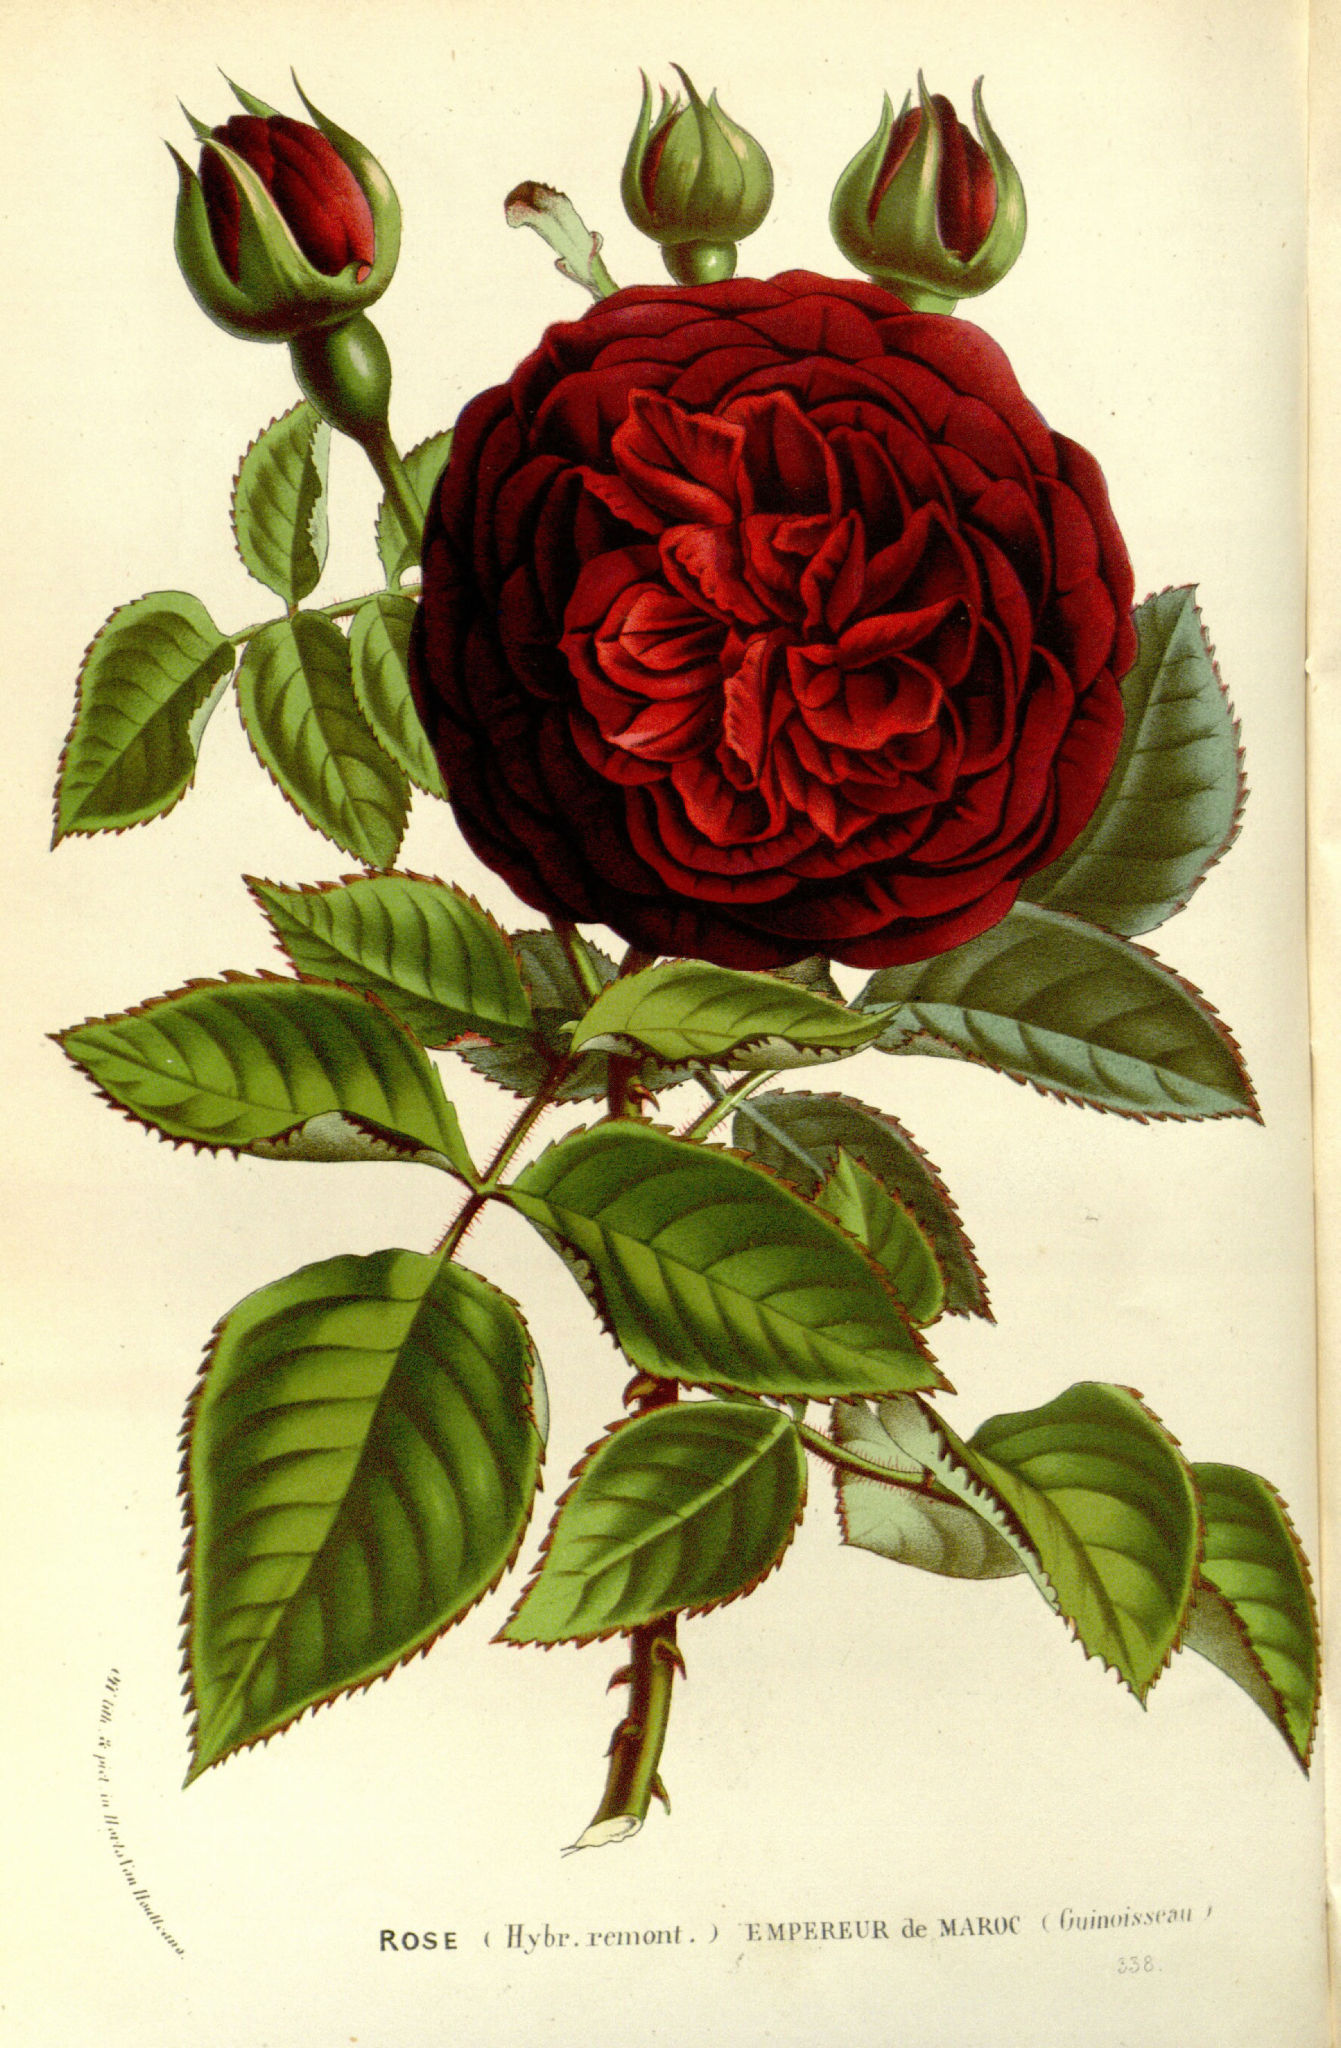 flore serres et jardins Europe - Flore serres et jardins d Europe ...